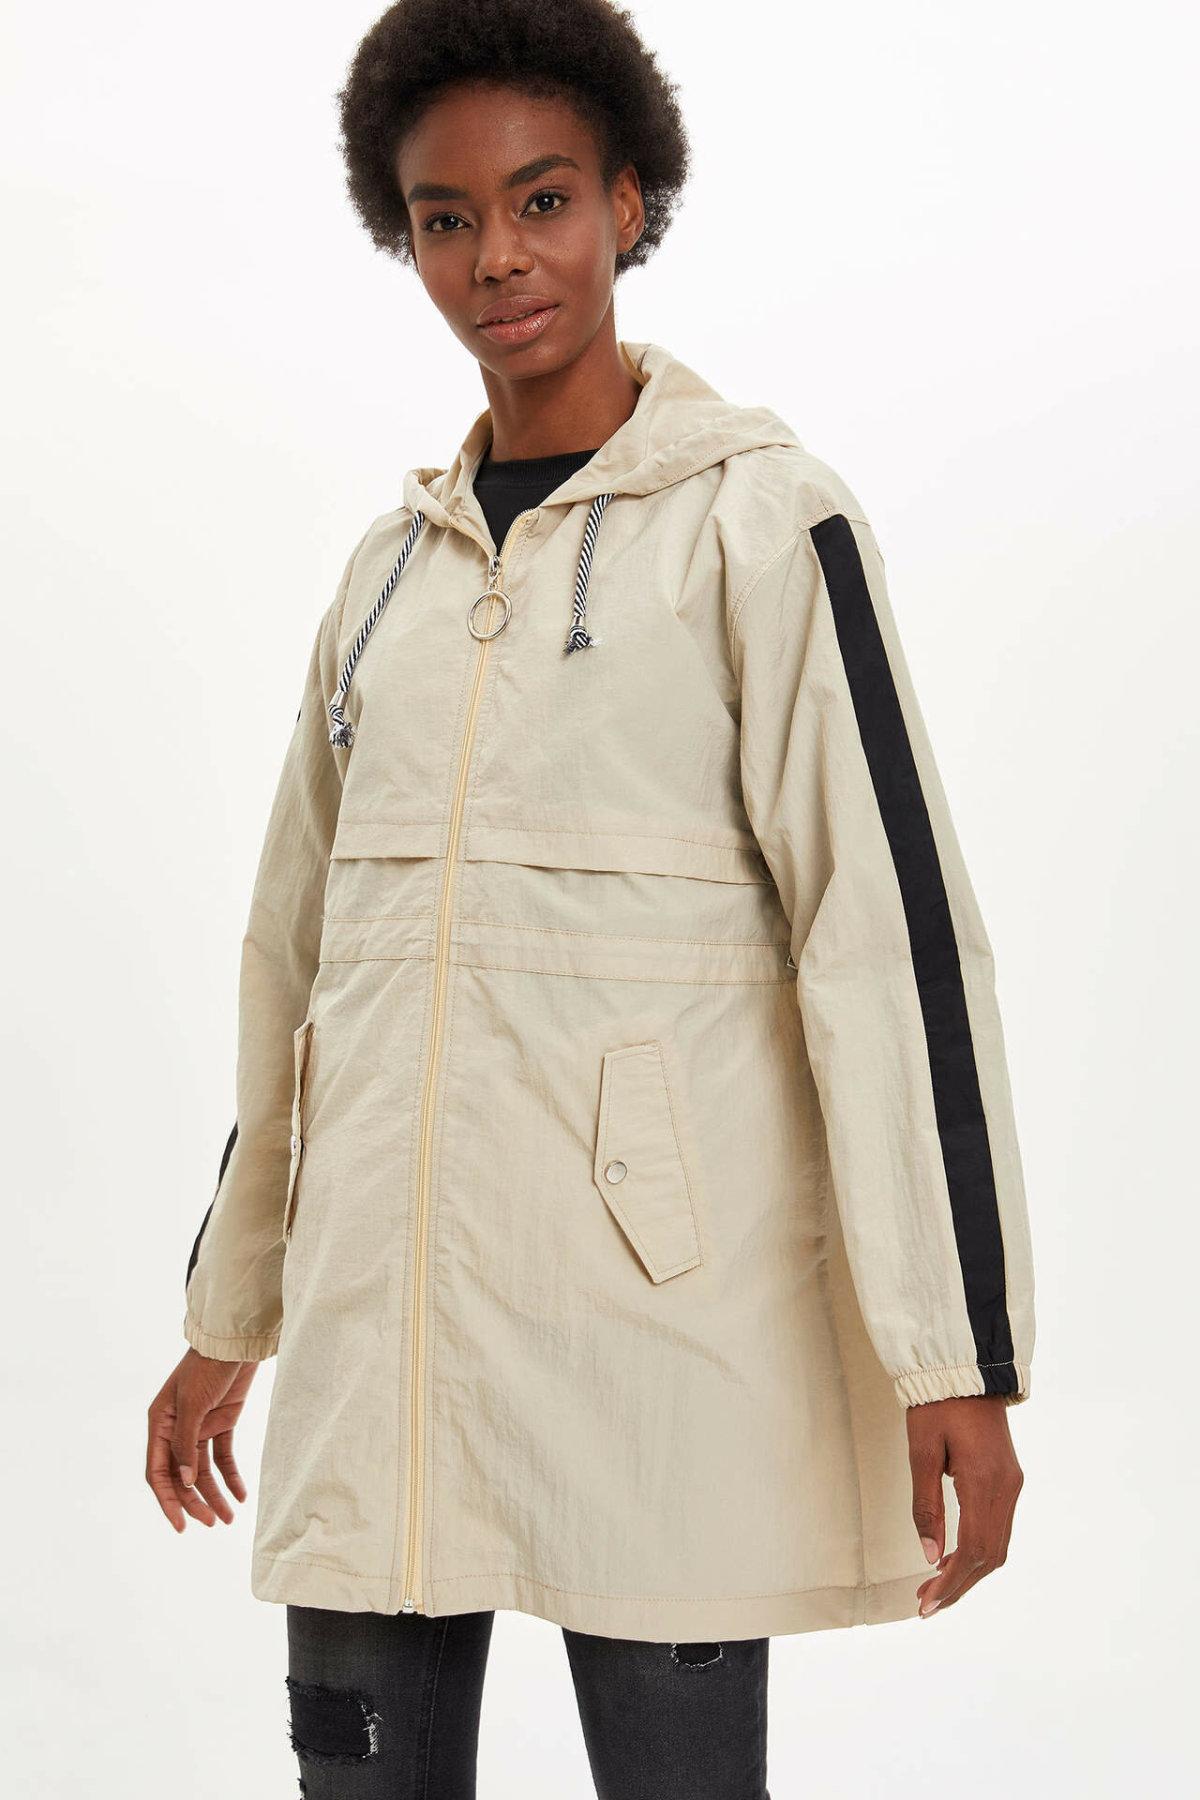 DeFacto Fashion Woman Hooded Solid Loose Coat Female Zipper Jackets For Women's Sportcoats Autumn Ladies - M7891AZ19AU